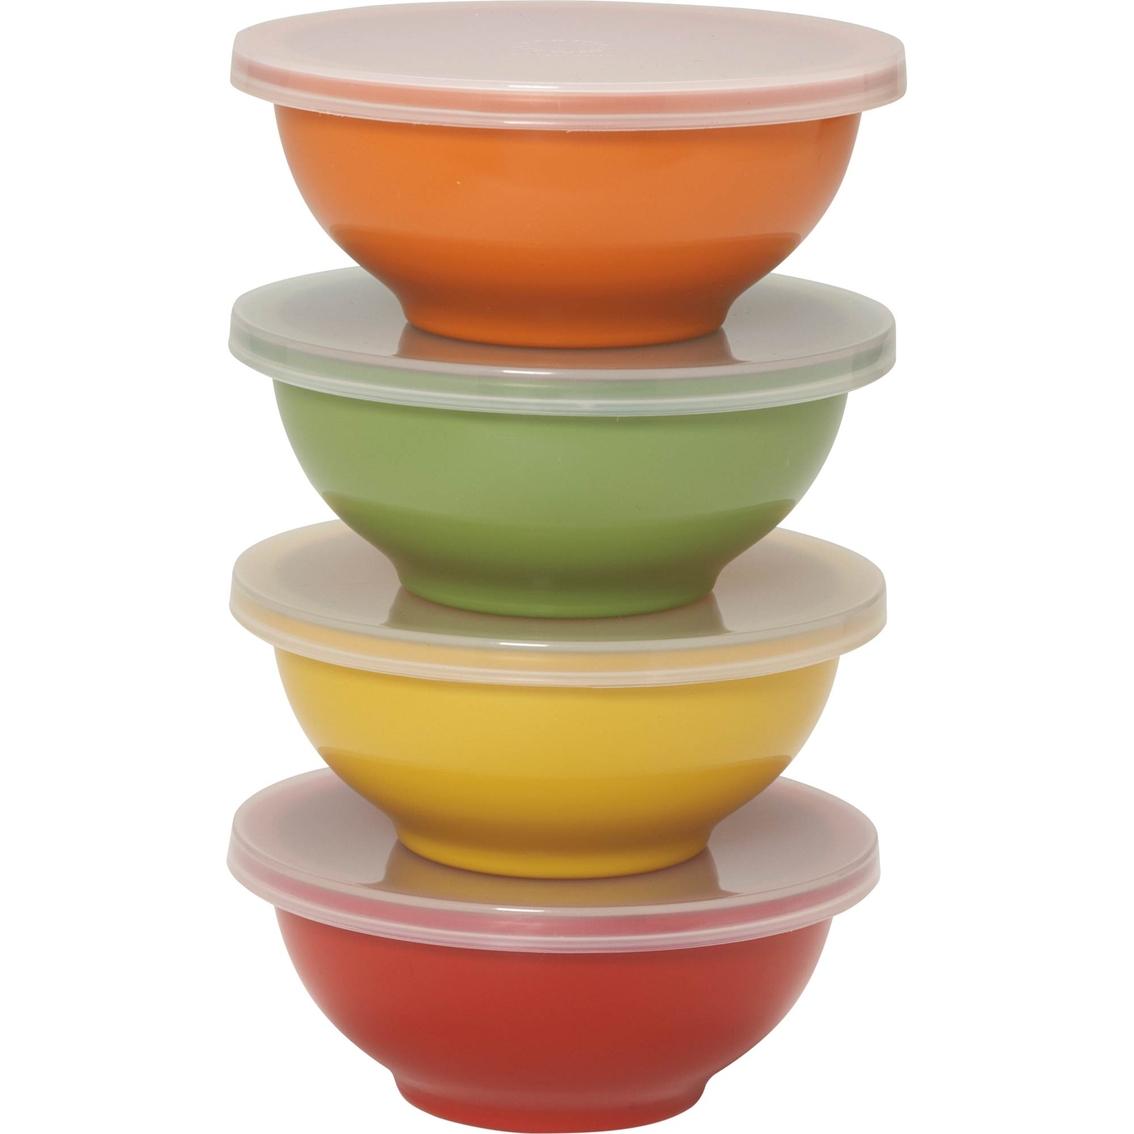 Martha Stewart Kitchen Cabinets Reviews Martha Stewart Collection 4 Pc Prep Bowl Set With Lids